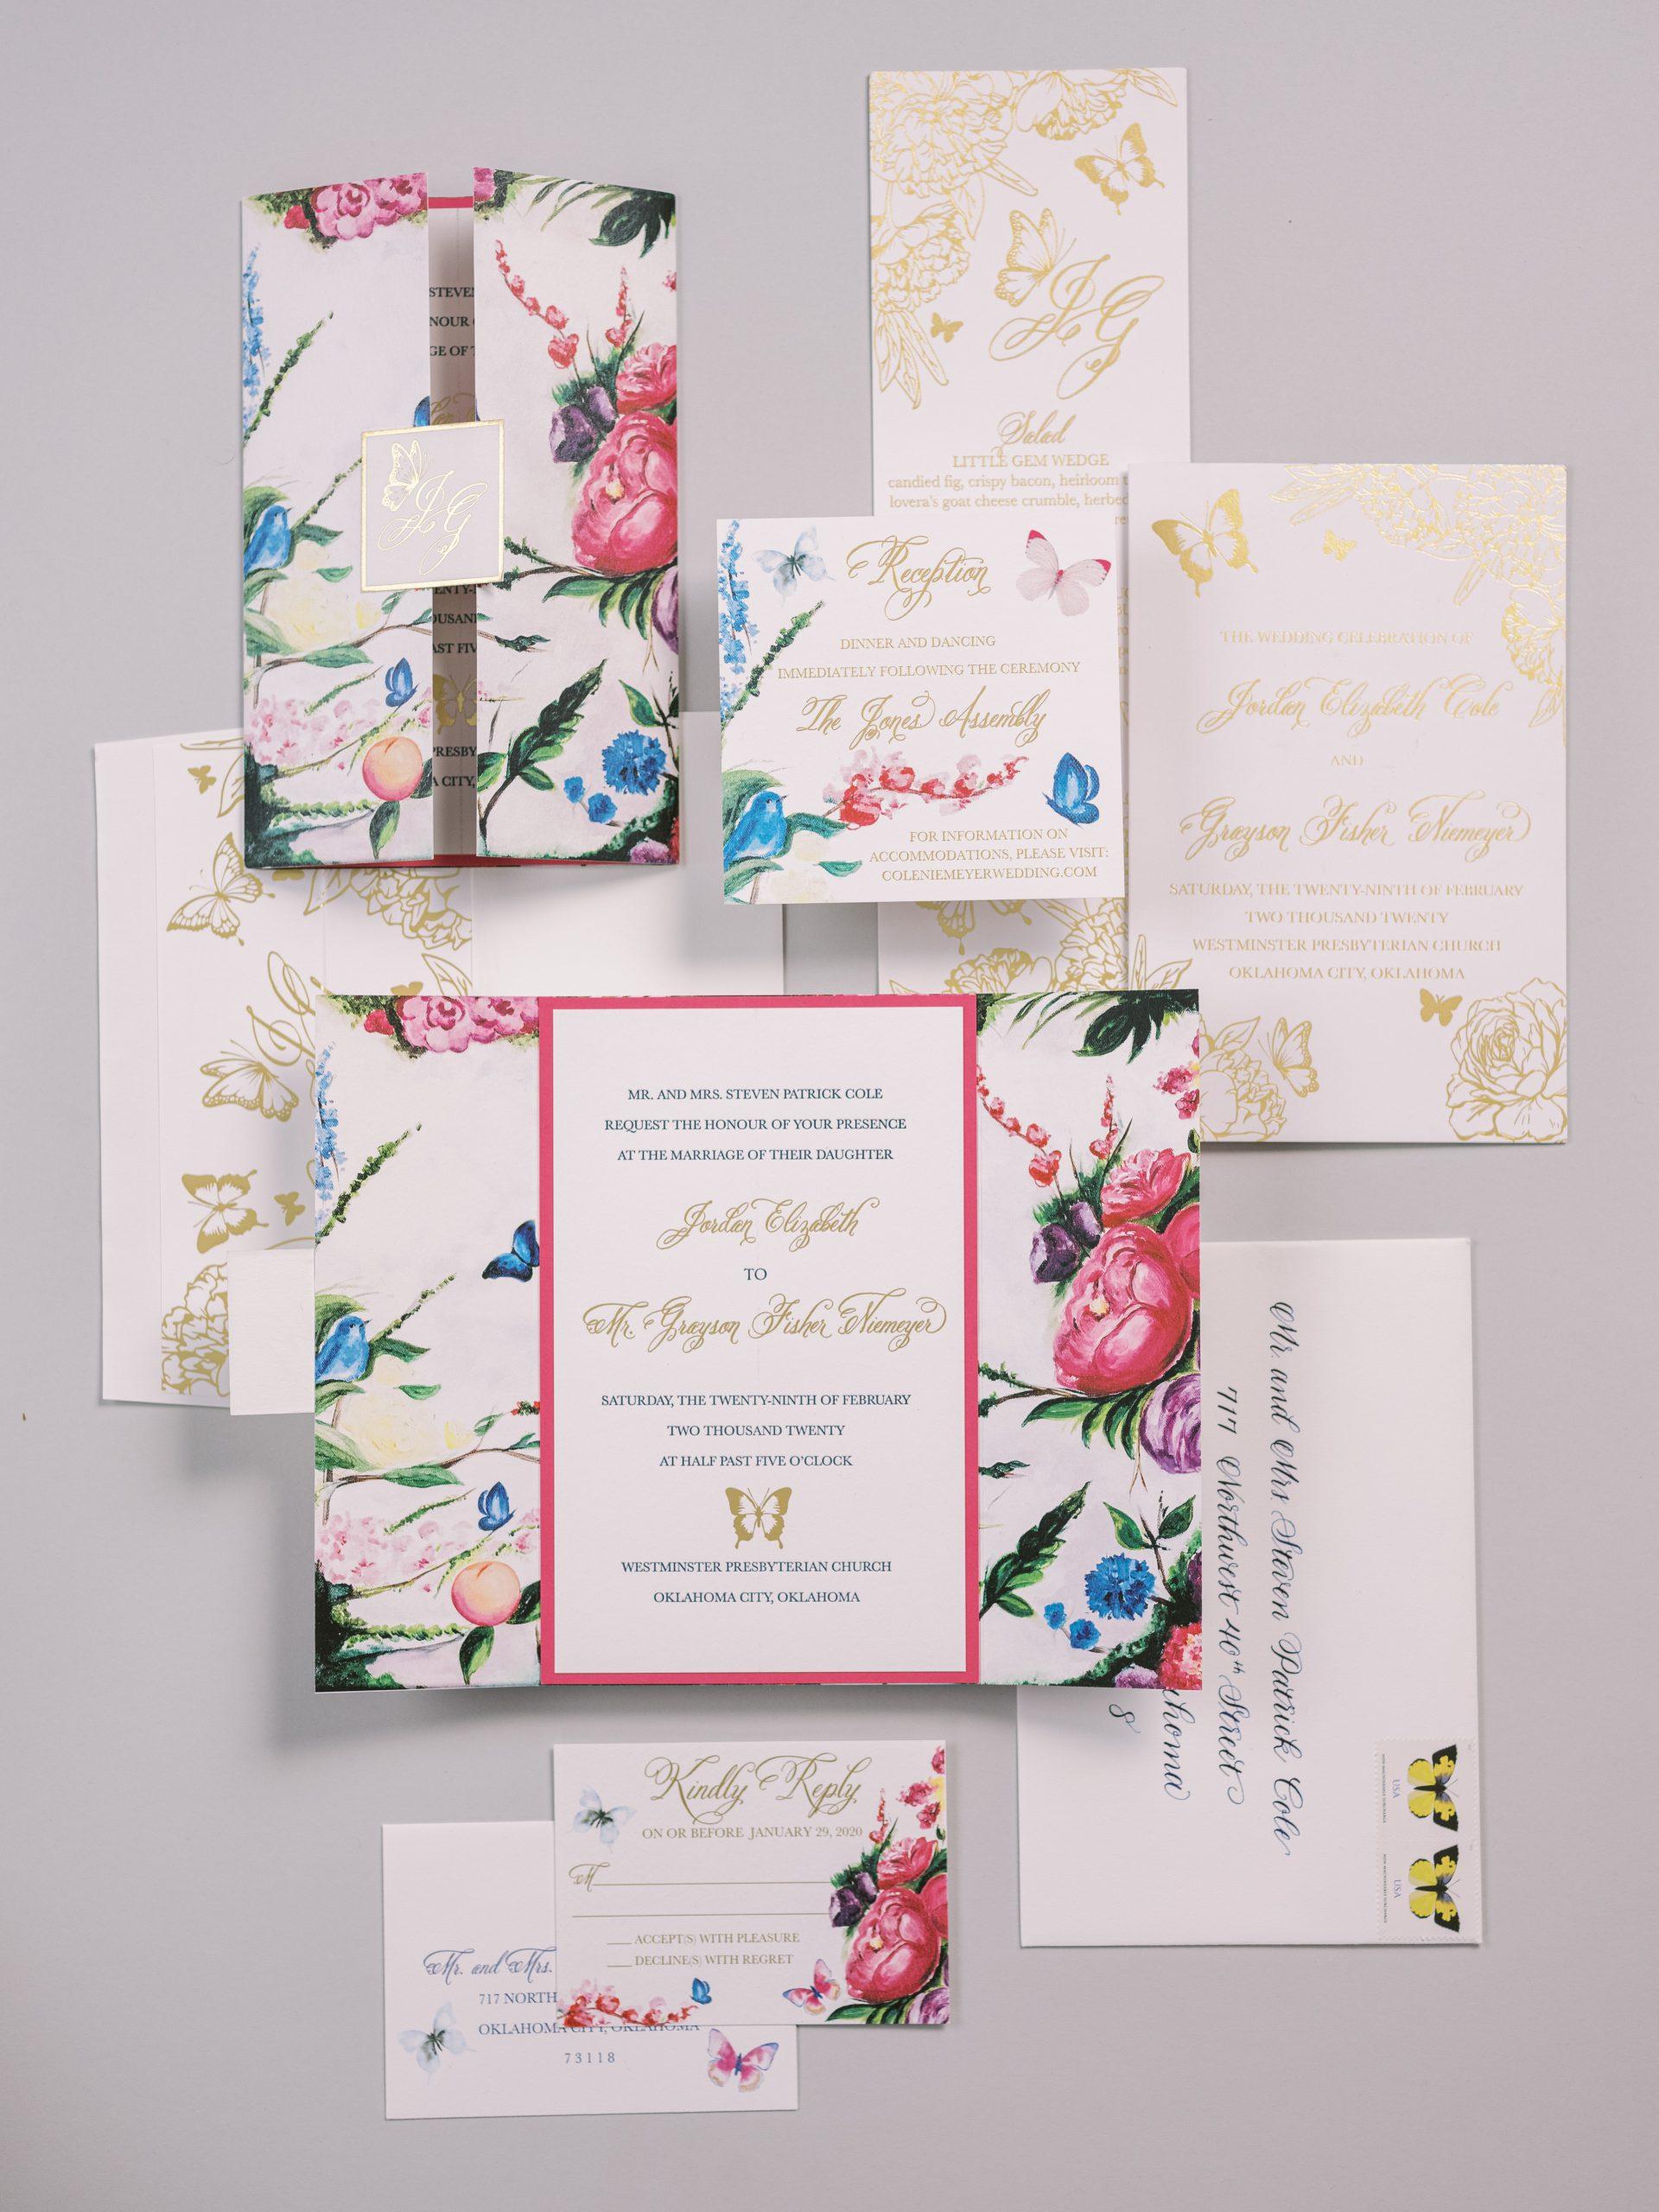 Butterfly Inspired Wedding_001